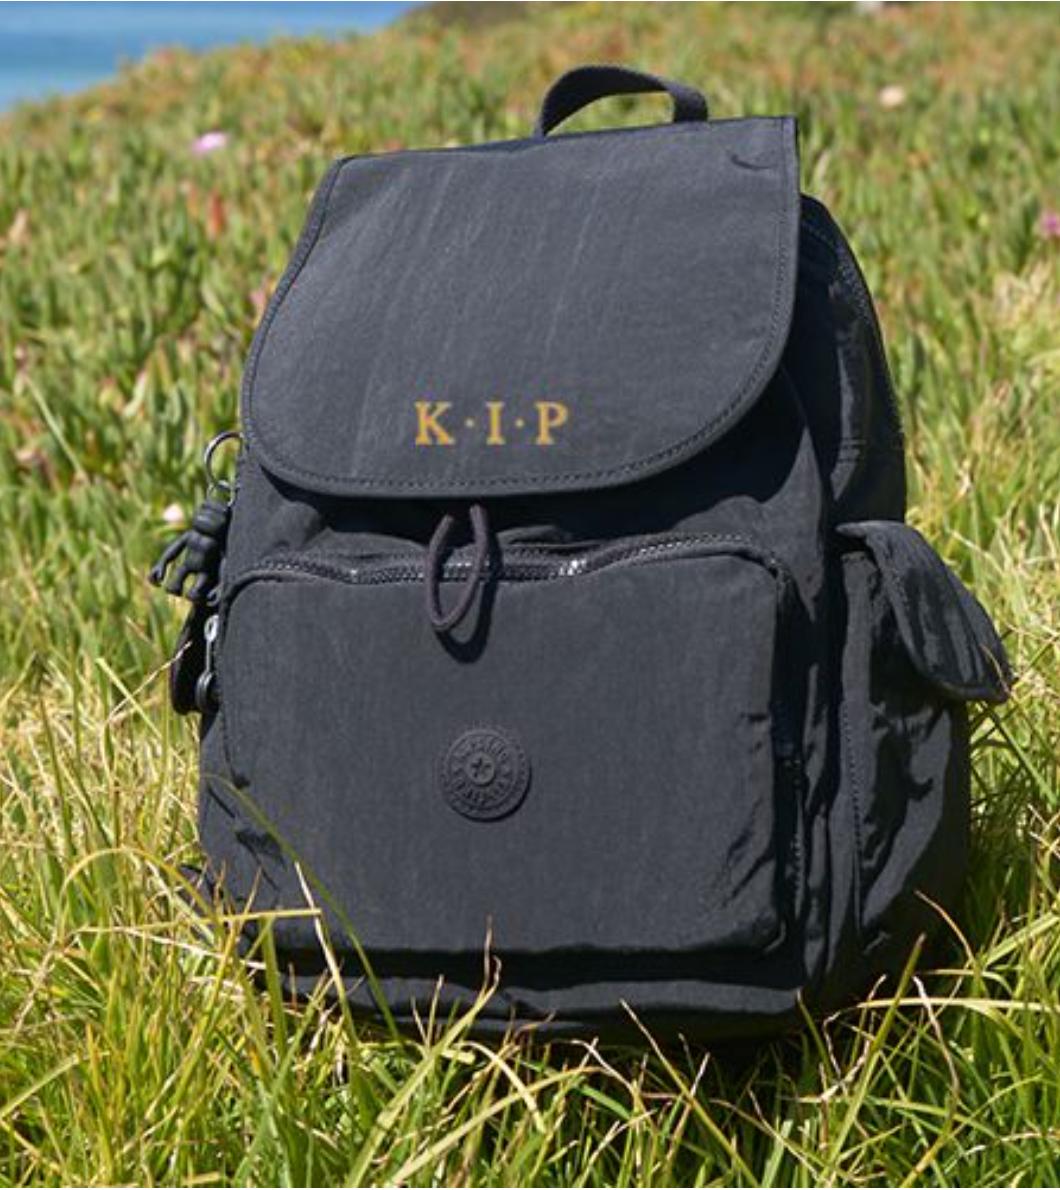 Kipling 25% off Luggage with FatCoupon